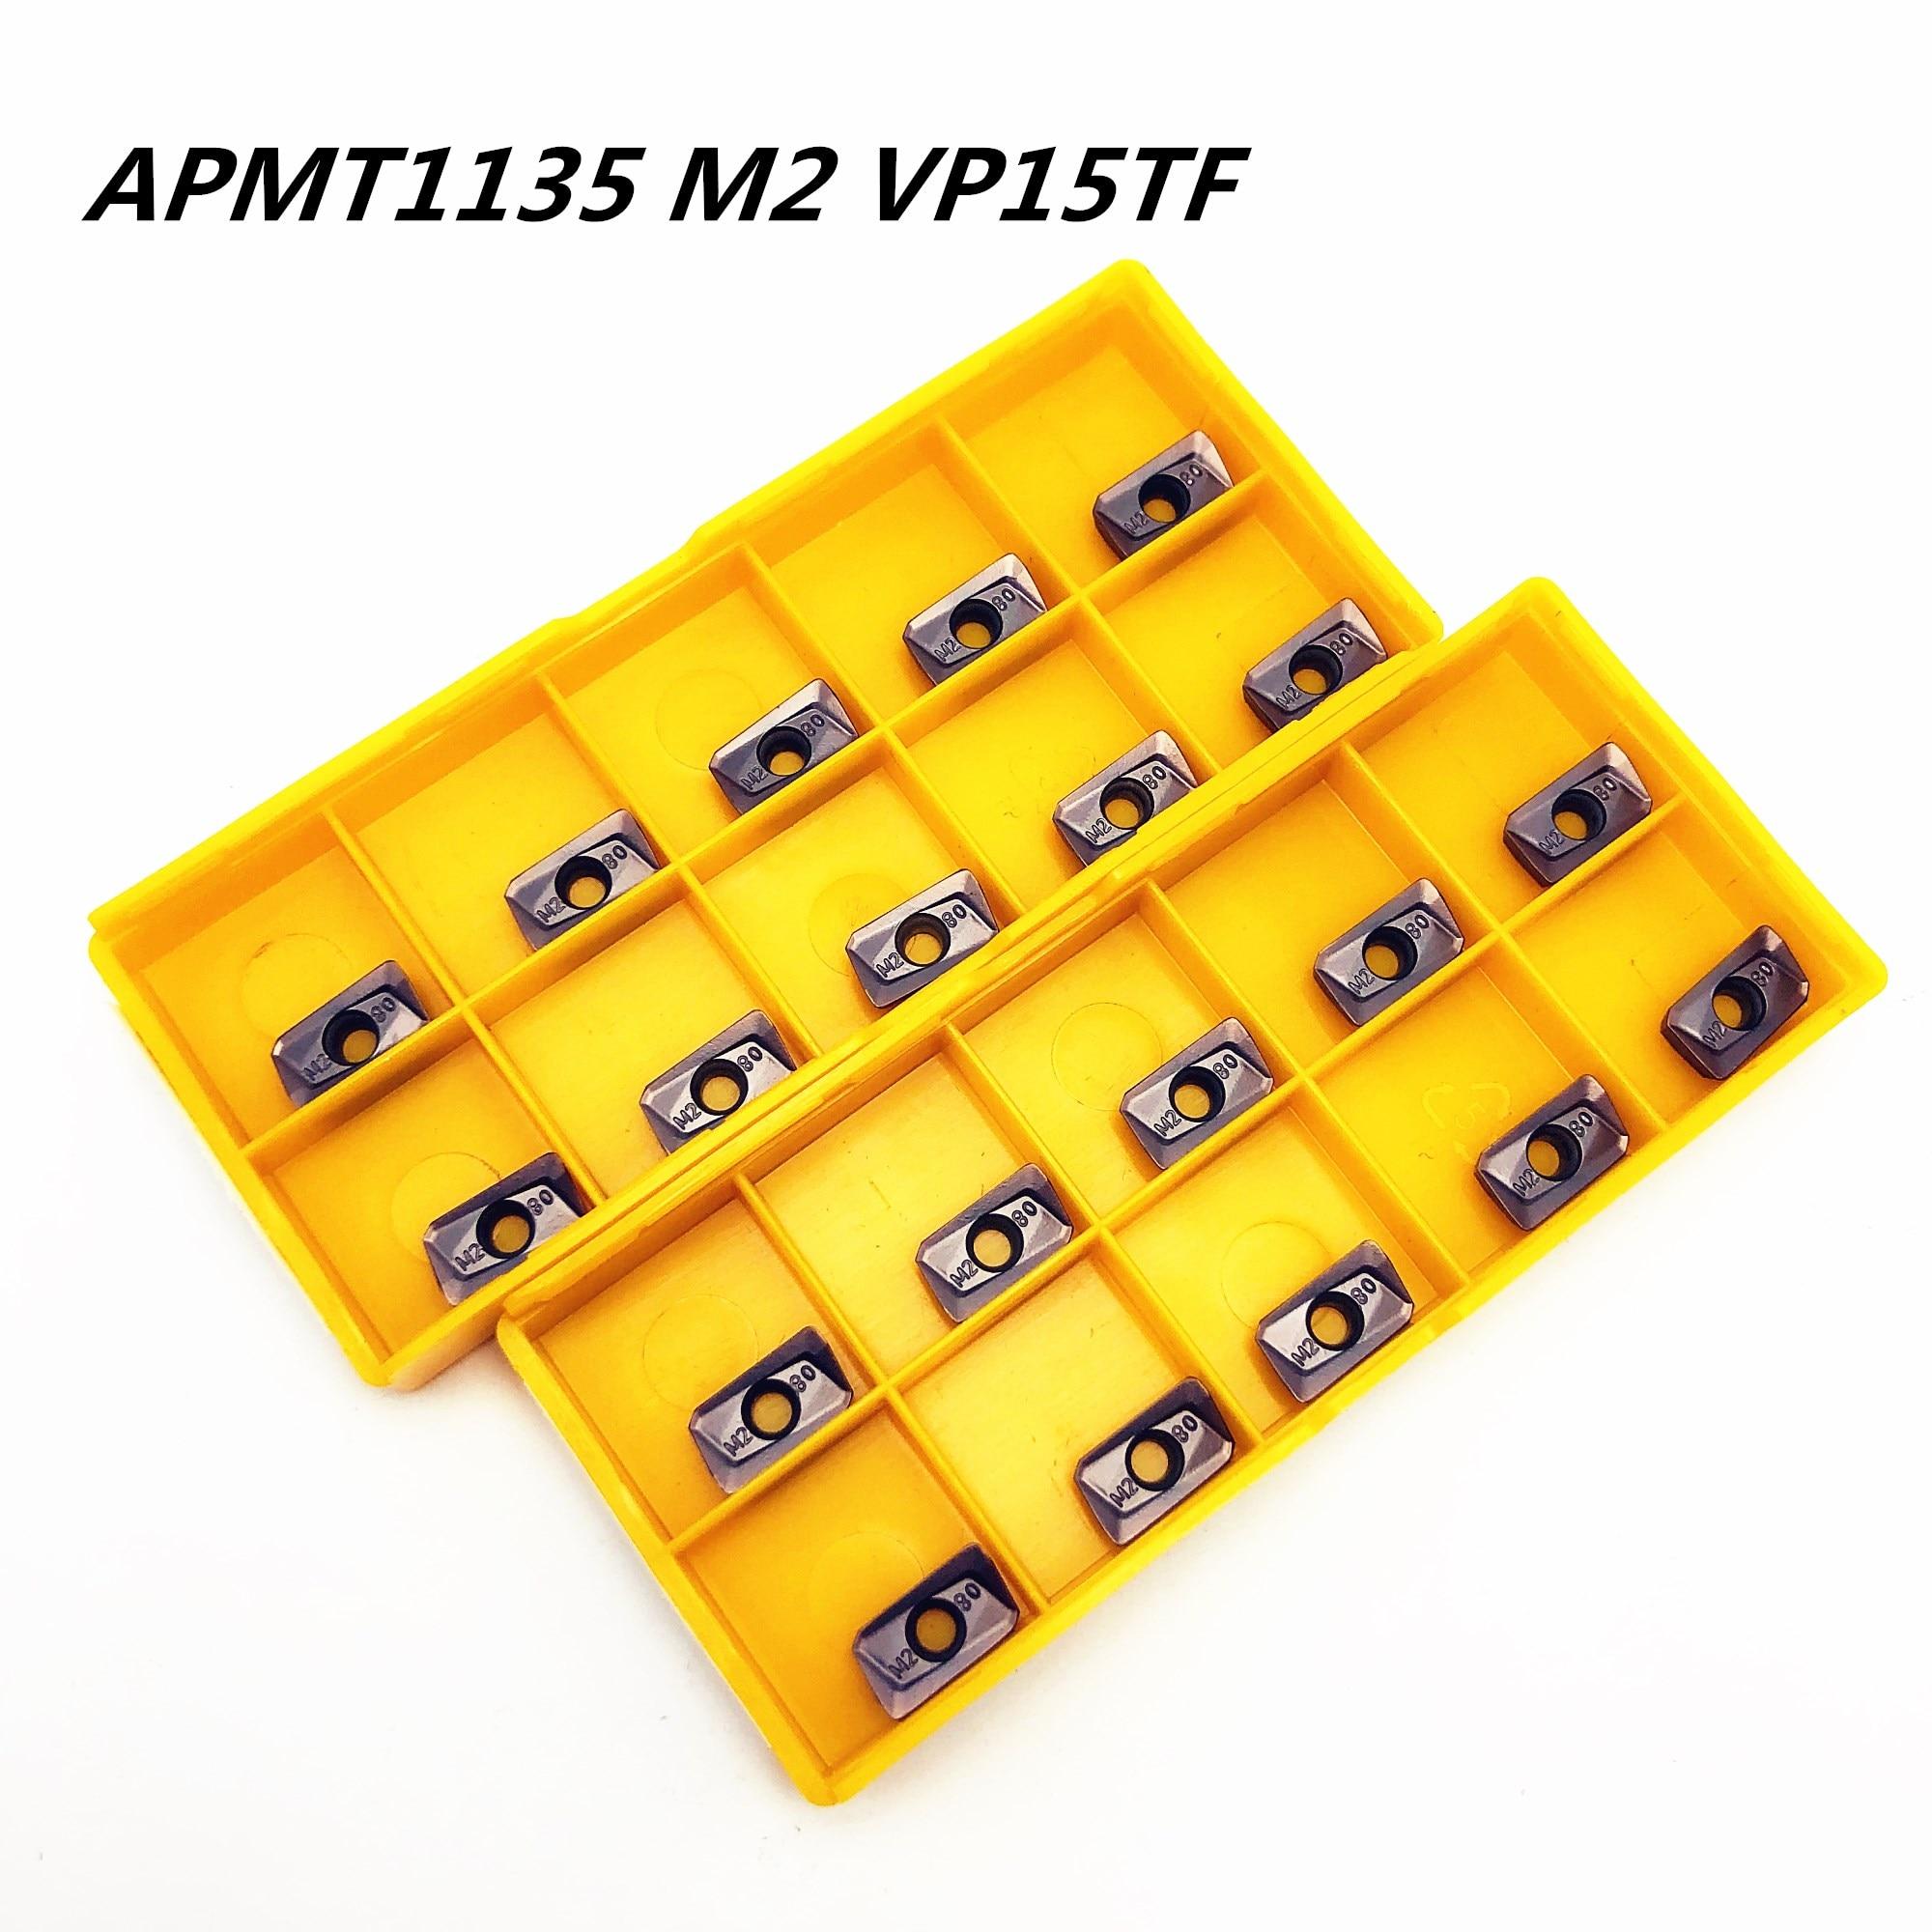 20PCS Carbide insert APMT 1135 PDER M2 VP15TF R0.8 plane milling machine lathe milling machine CNC tool APMT 1135 lathe tool